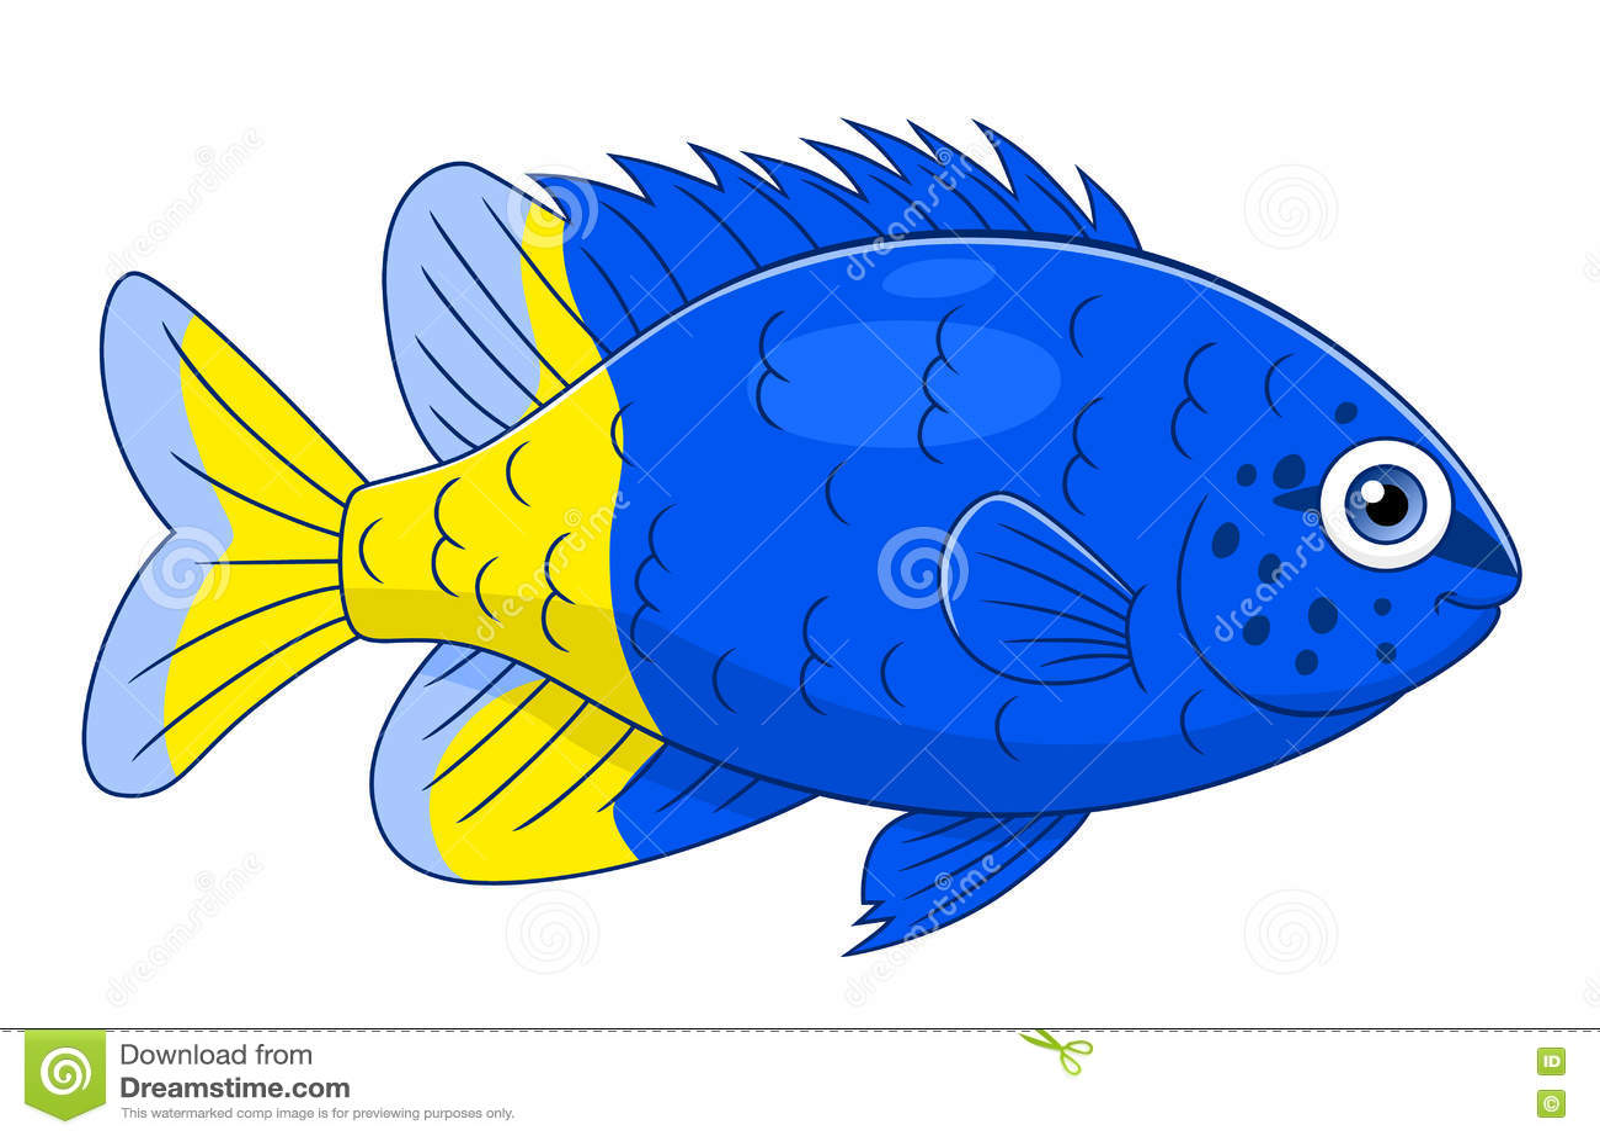 Download Cartoon Yellowtail Damselfish Stock Vector